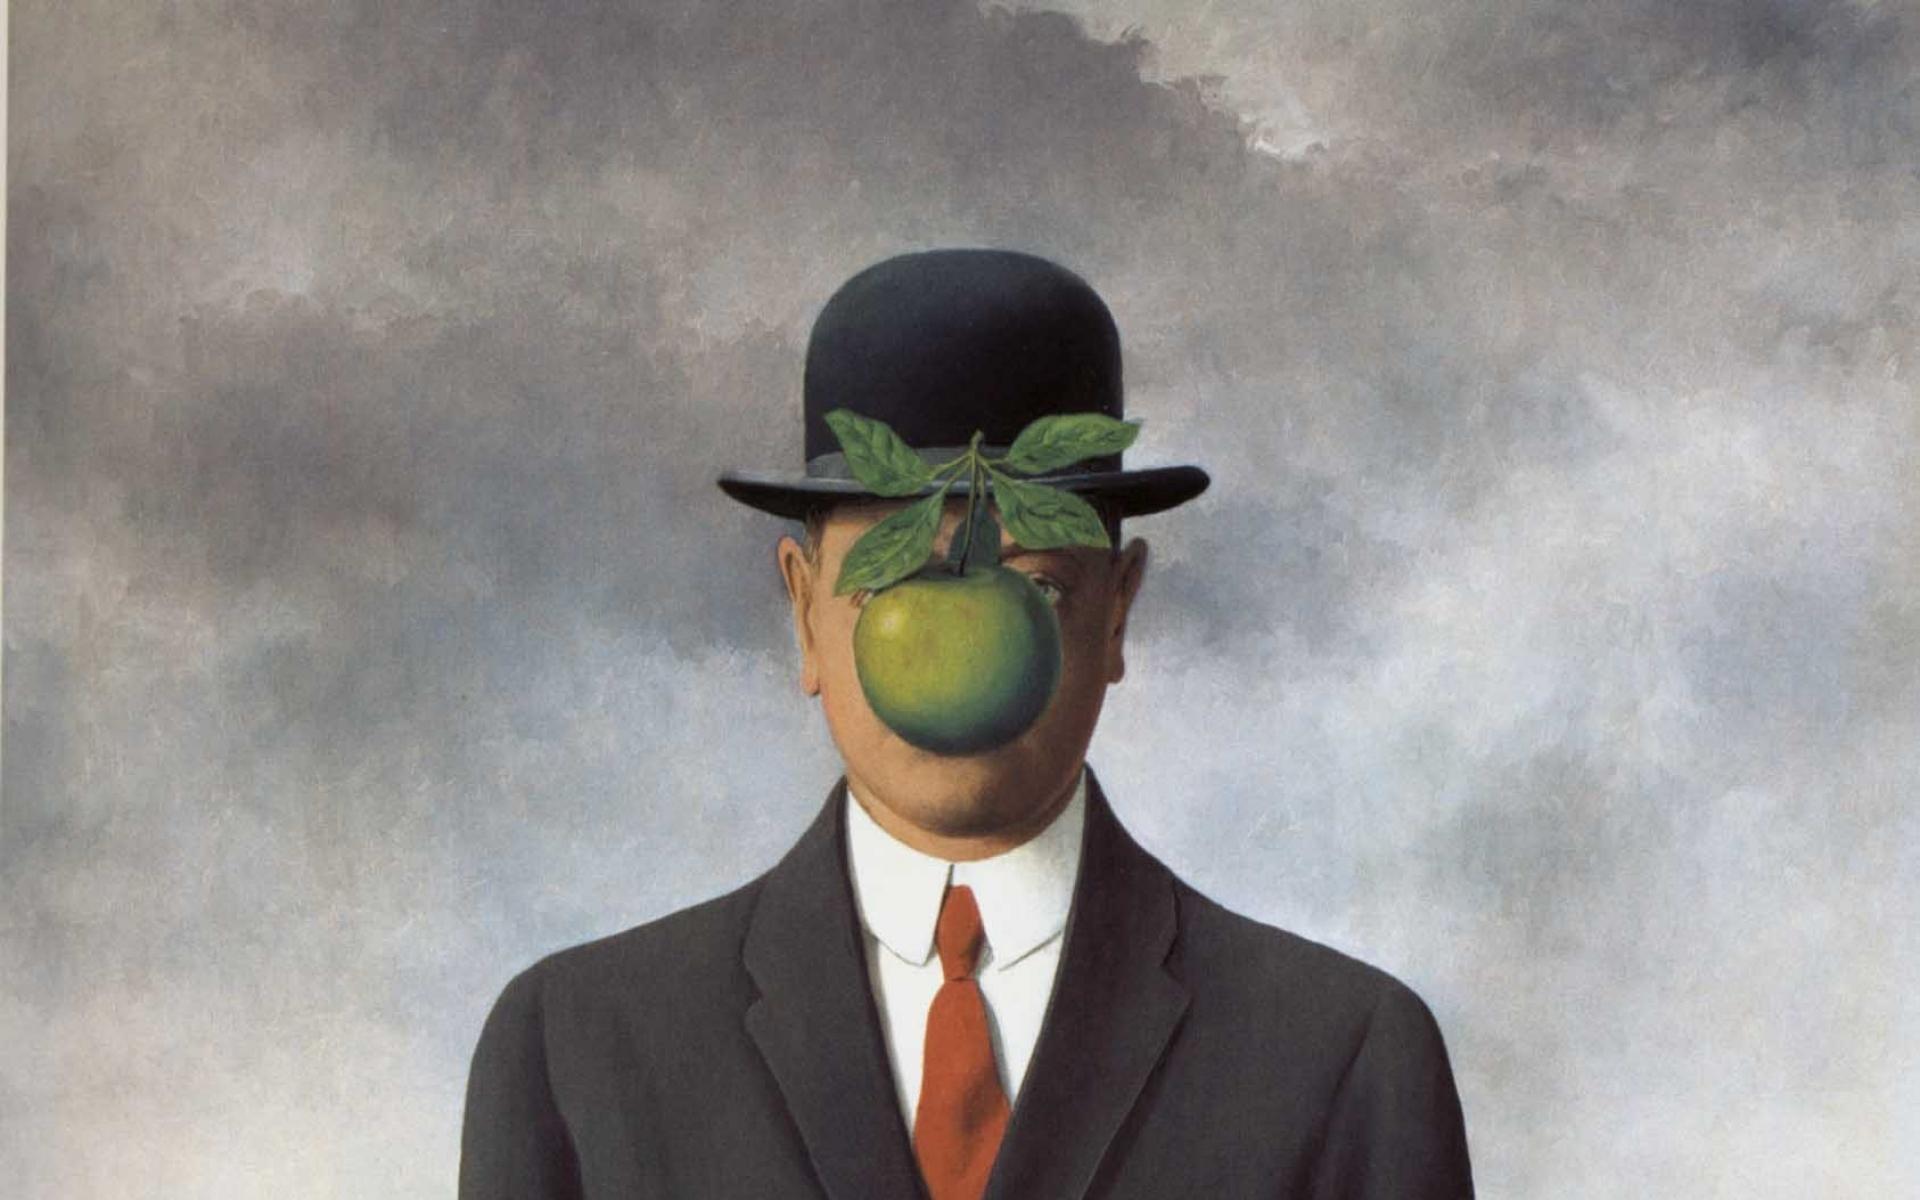 magritte son of man 1686x2198 wallpaper High Resolution WallpaperHi 1920x1200